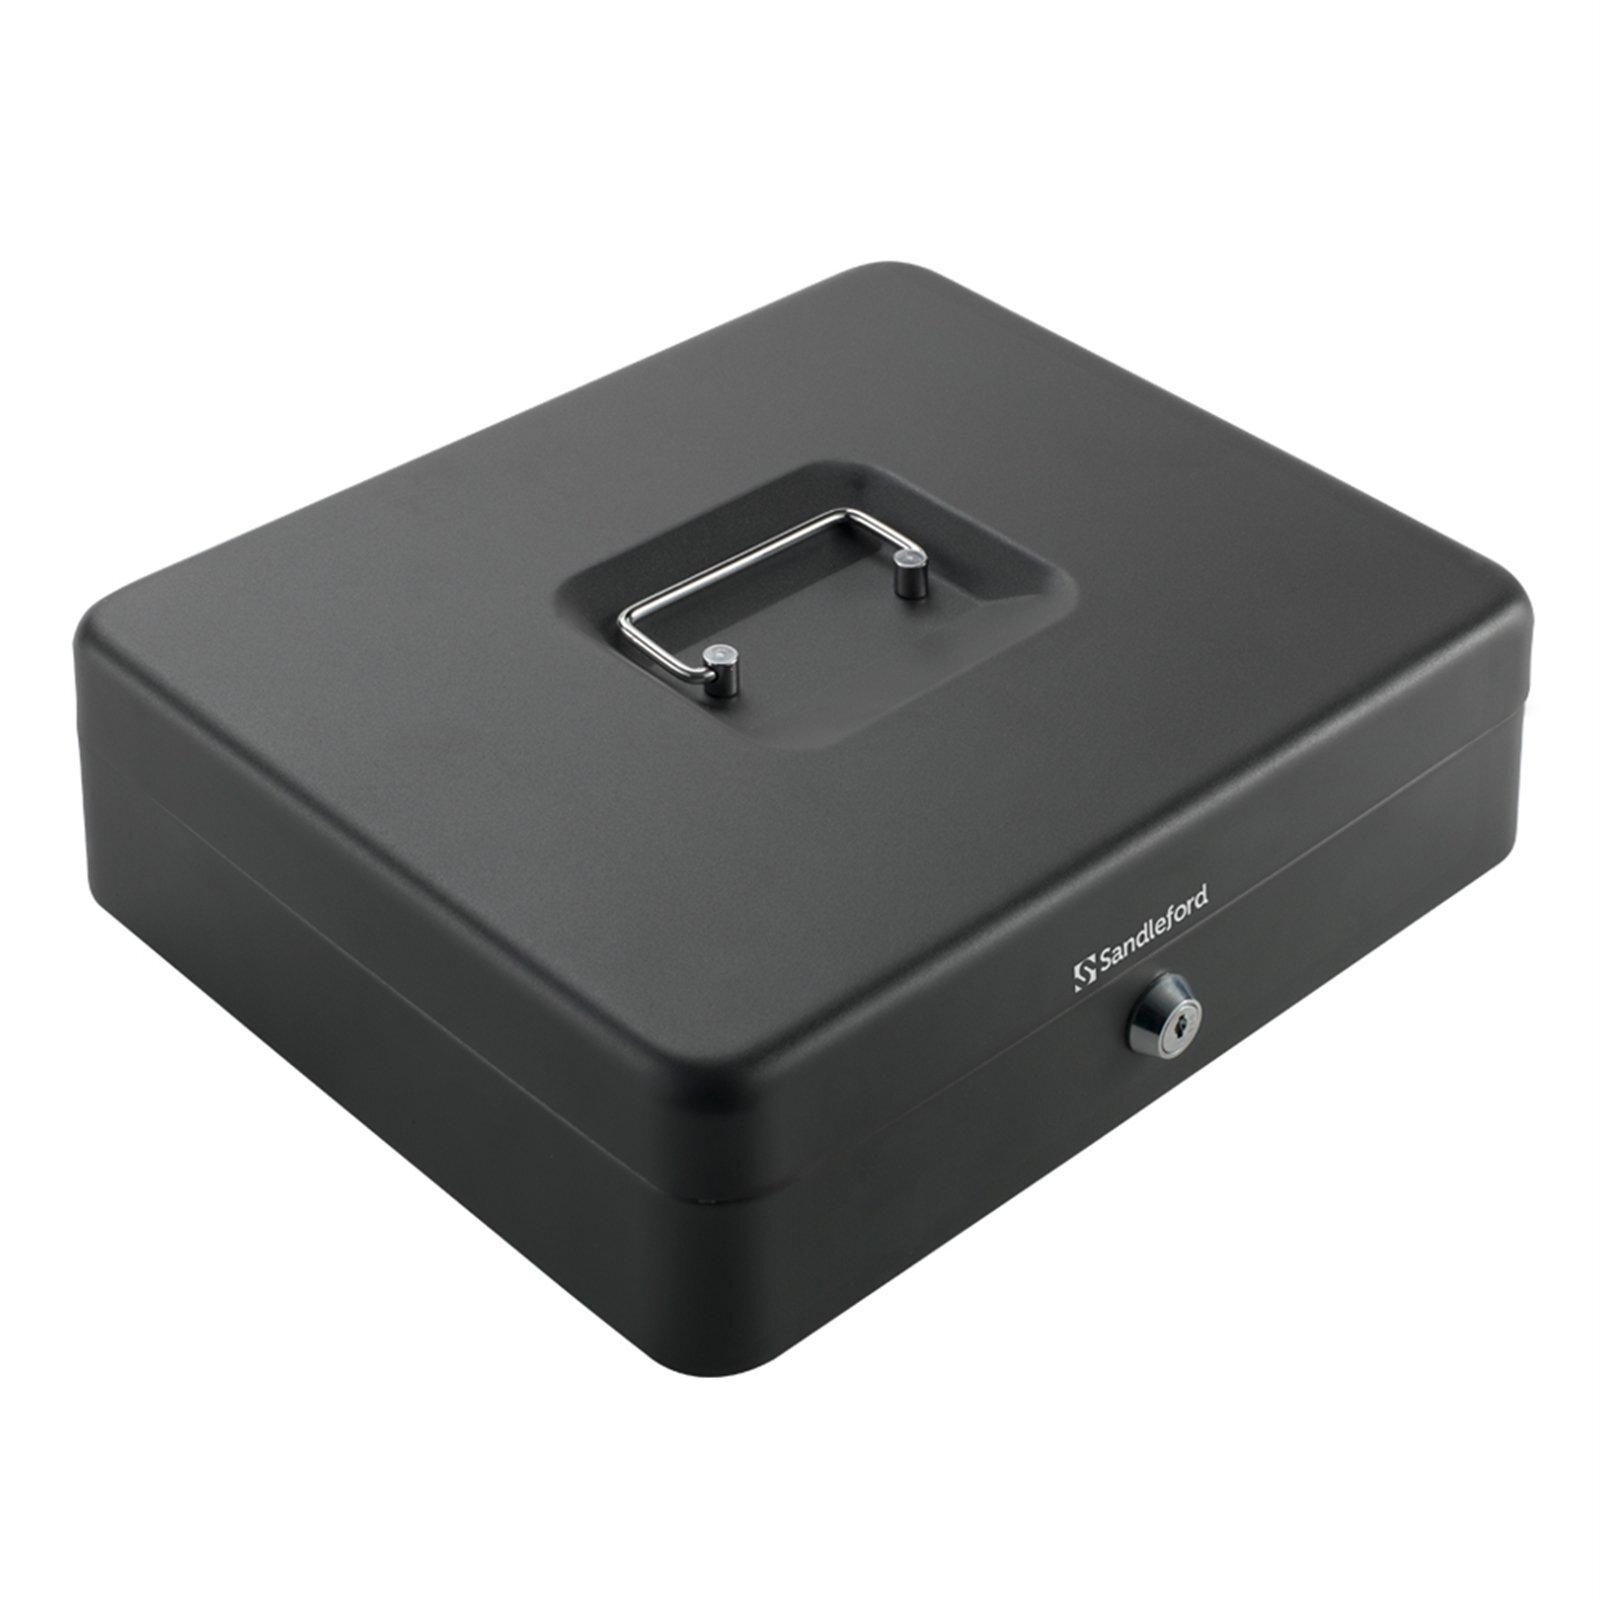 Sandleford 300mm Black Xlarge Cash Box